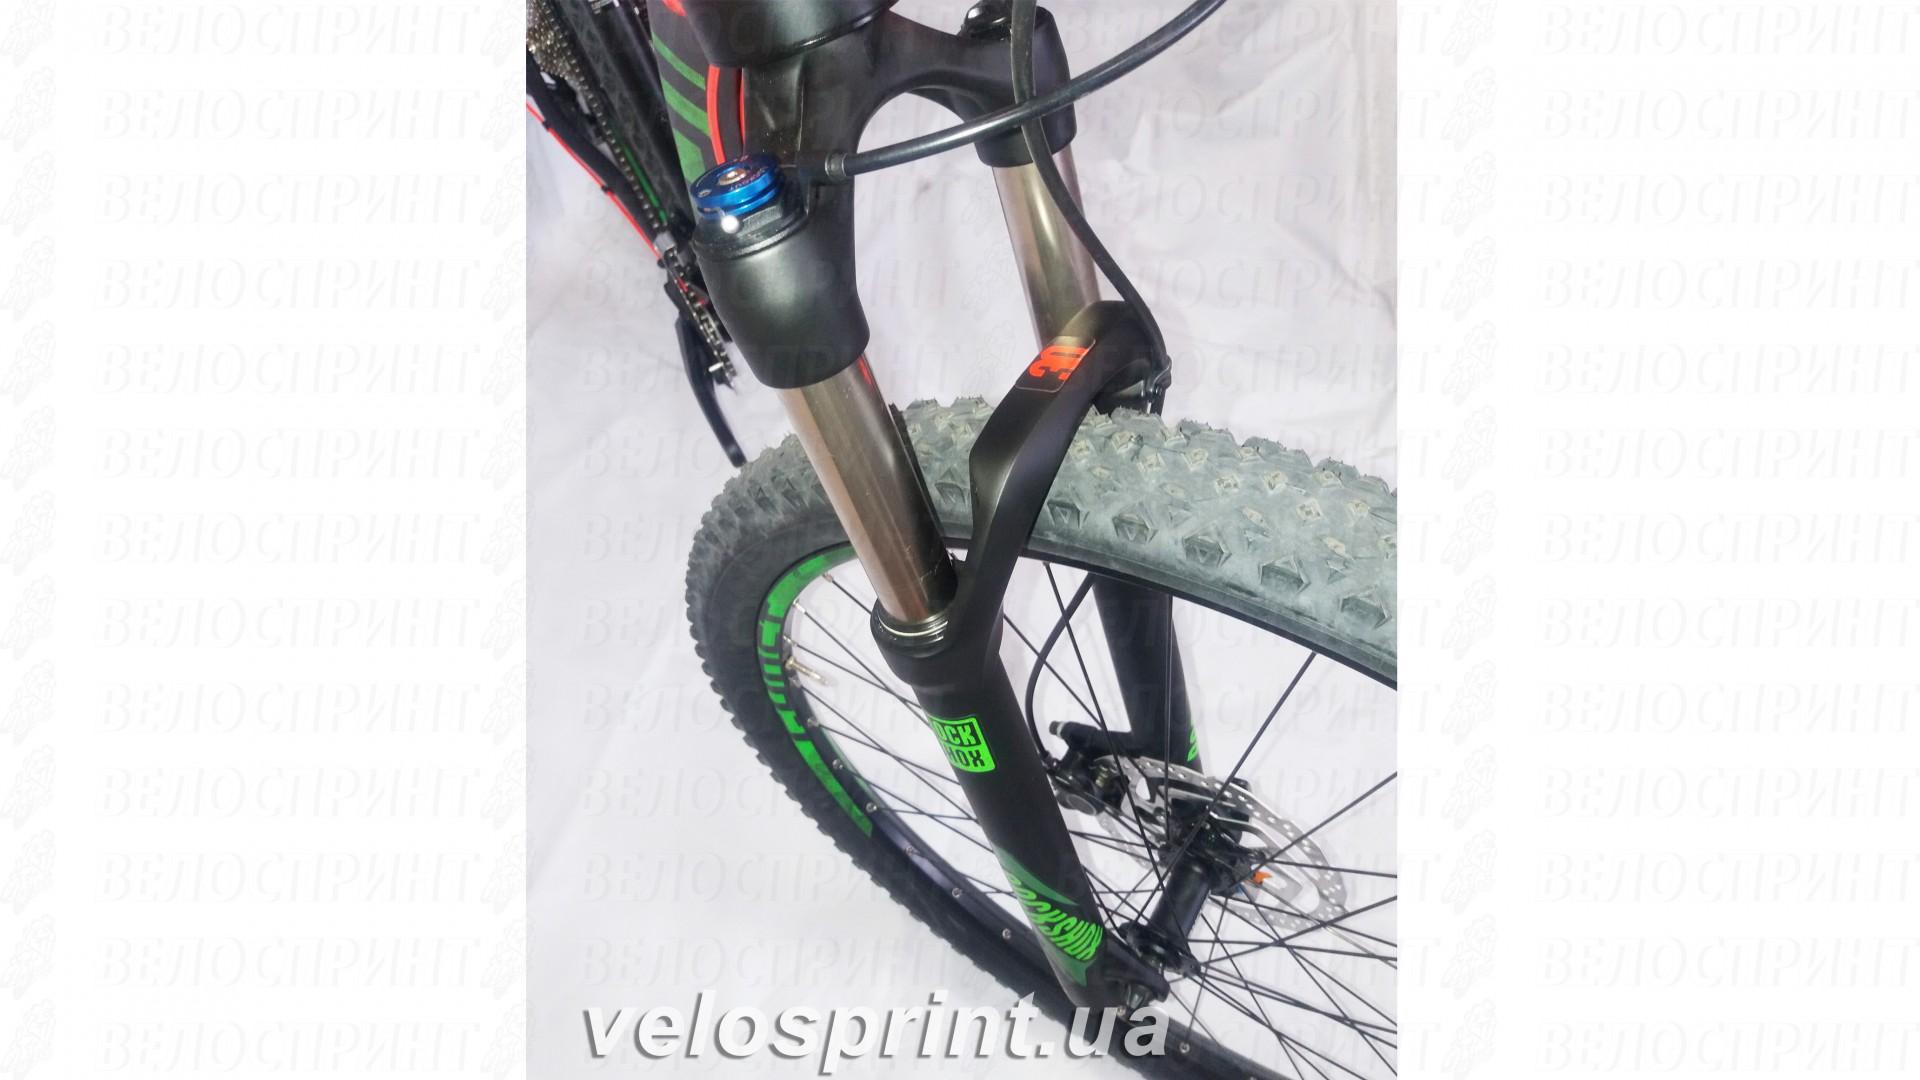 Велосипед GHOST Kato 7 AL 29 nightblack/riotgreen/neonred вилка год 2017